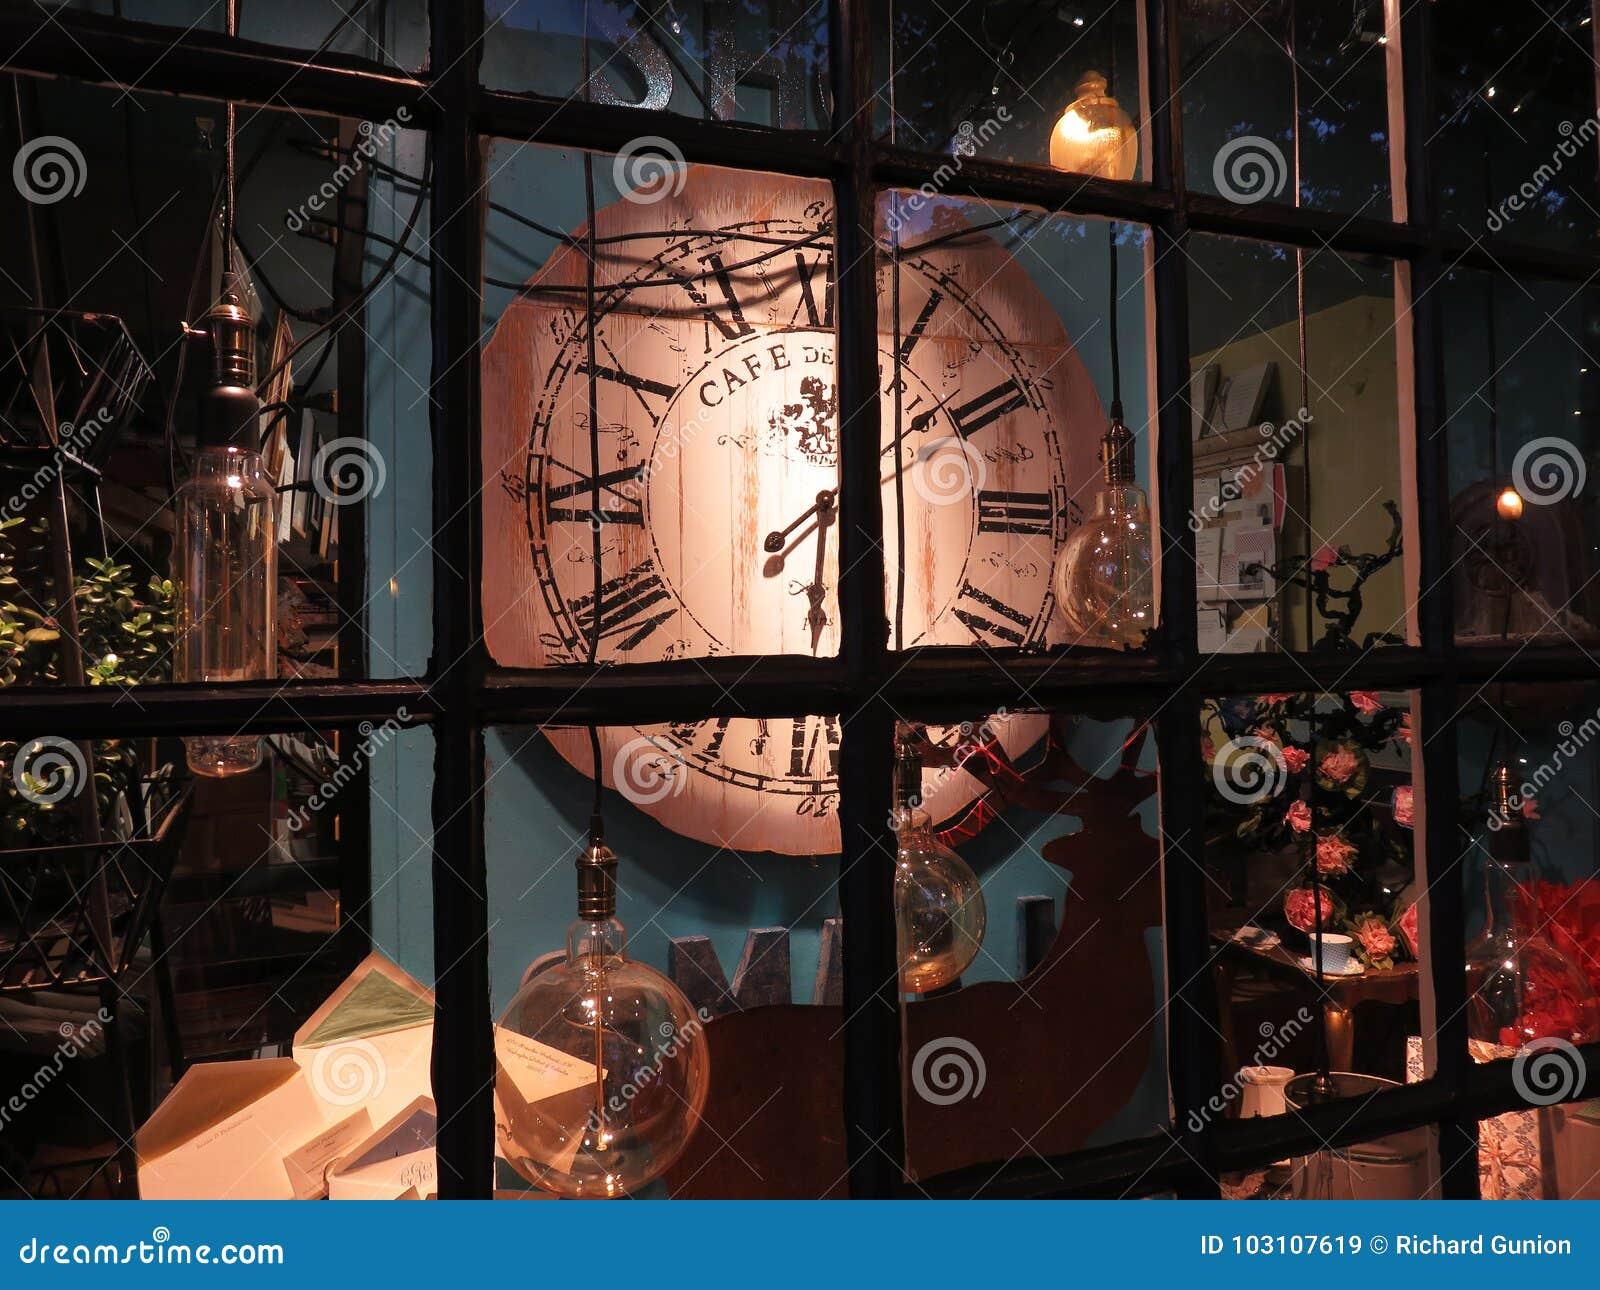 Georgetown Store Window at Night